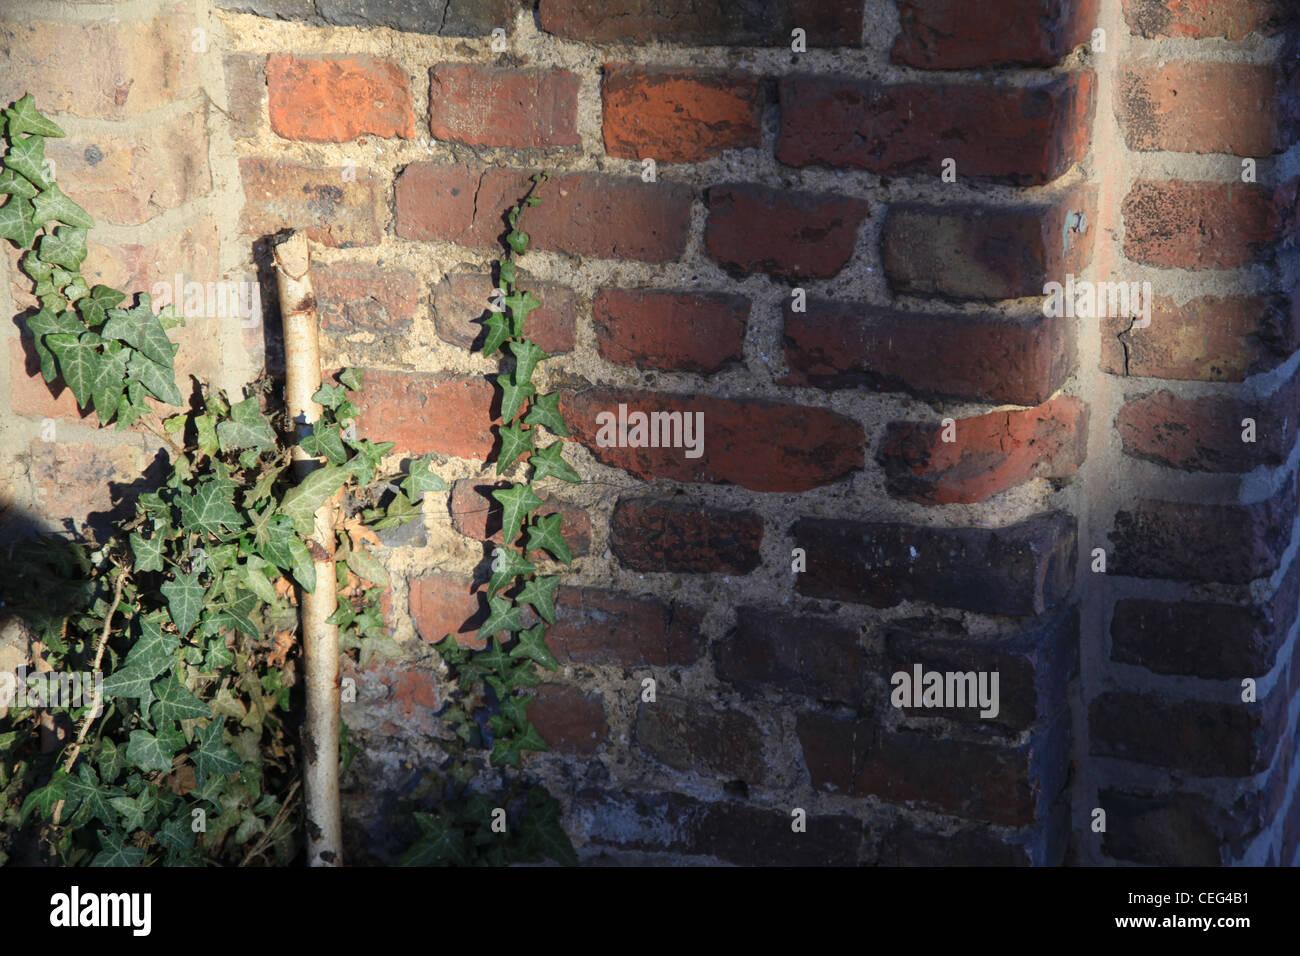 Antike Mauer in der Sonne mit Efeu, un antiguo muro en el sol con ivy, Klinker, Schatten, sombra positiv, Braun, Imagen De Stock